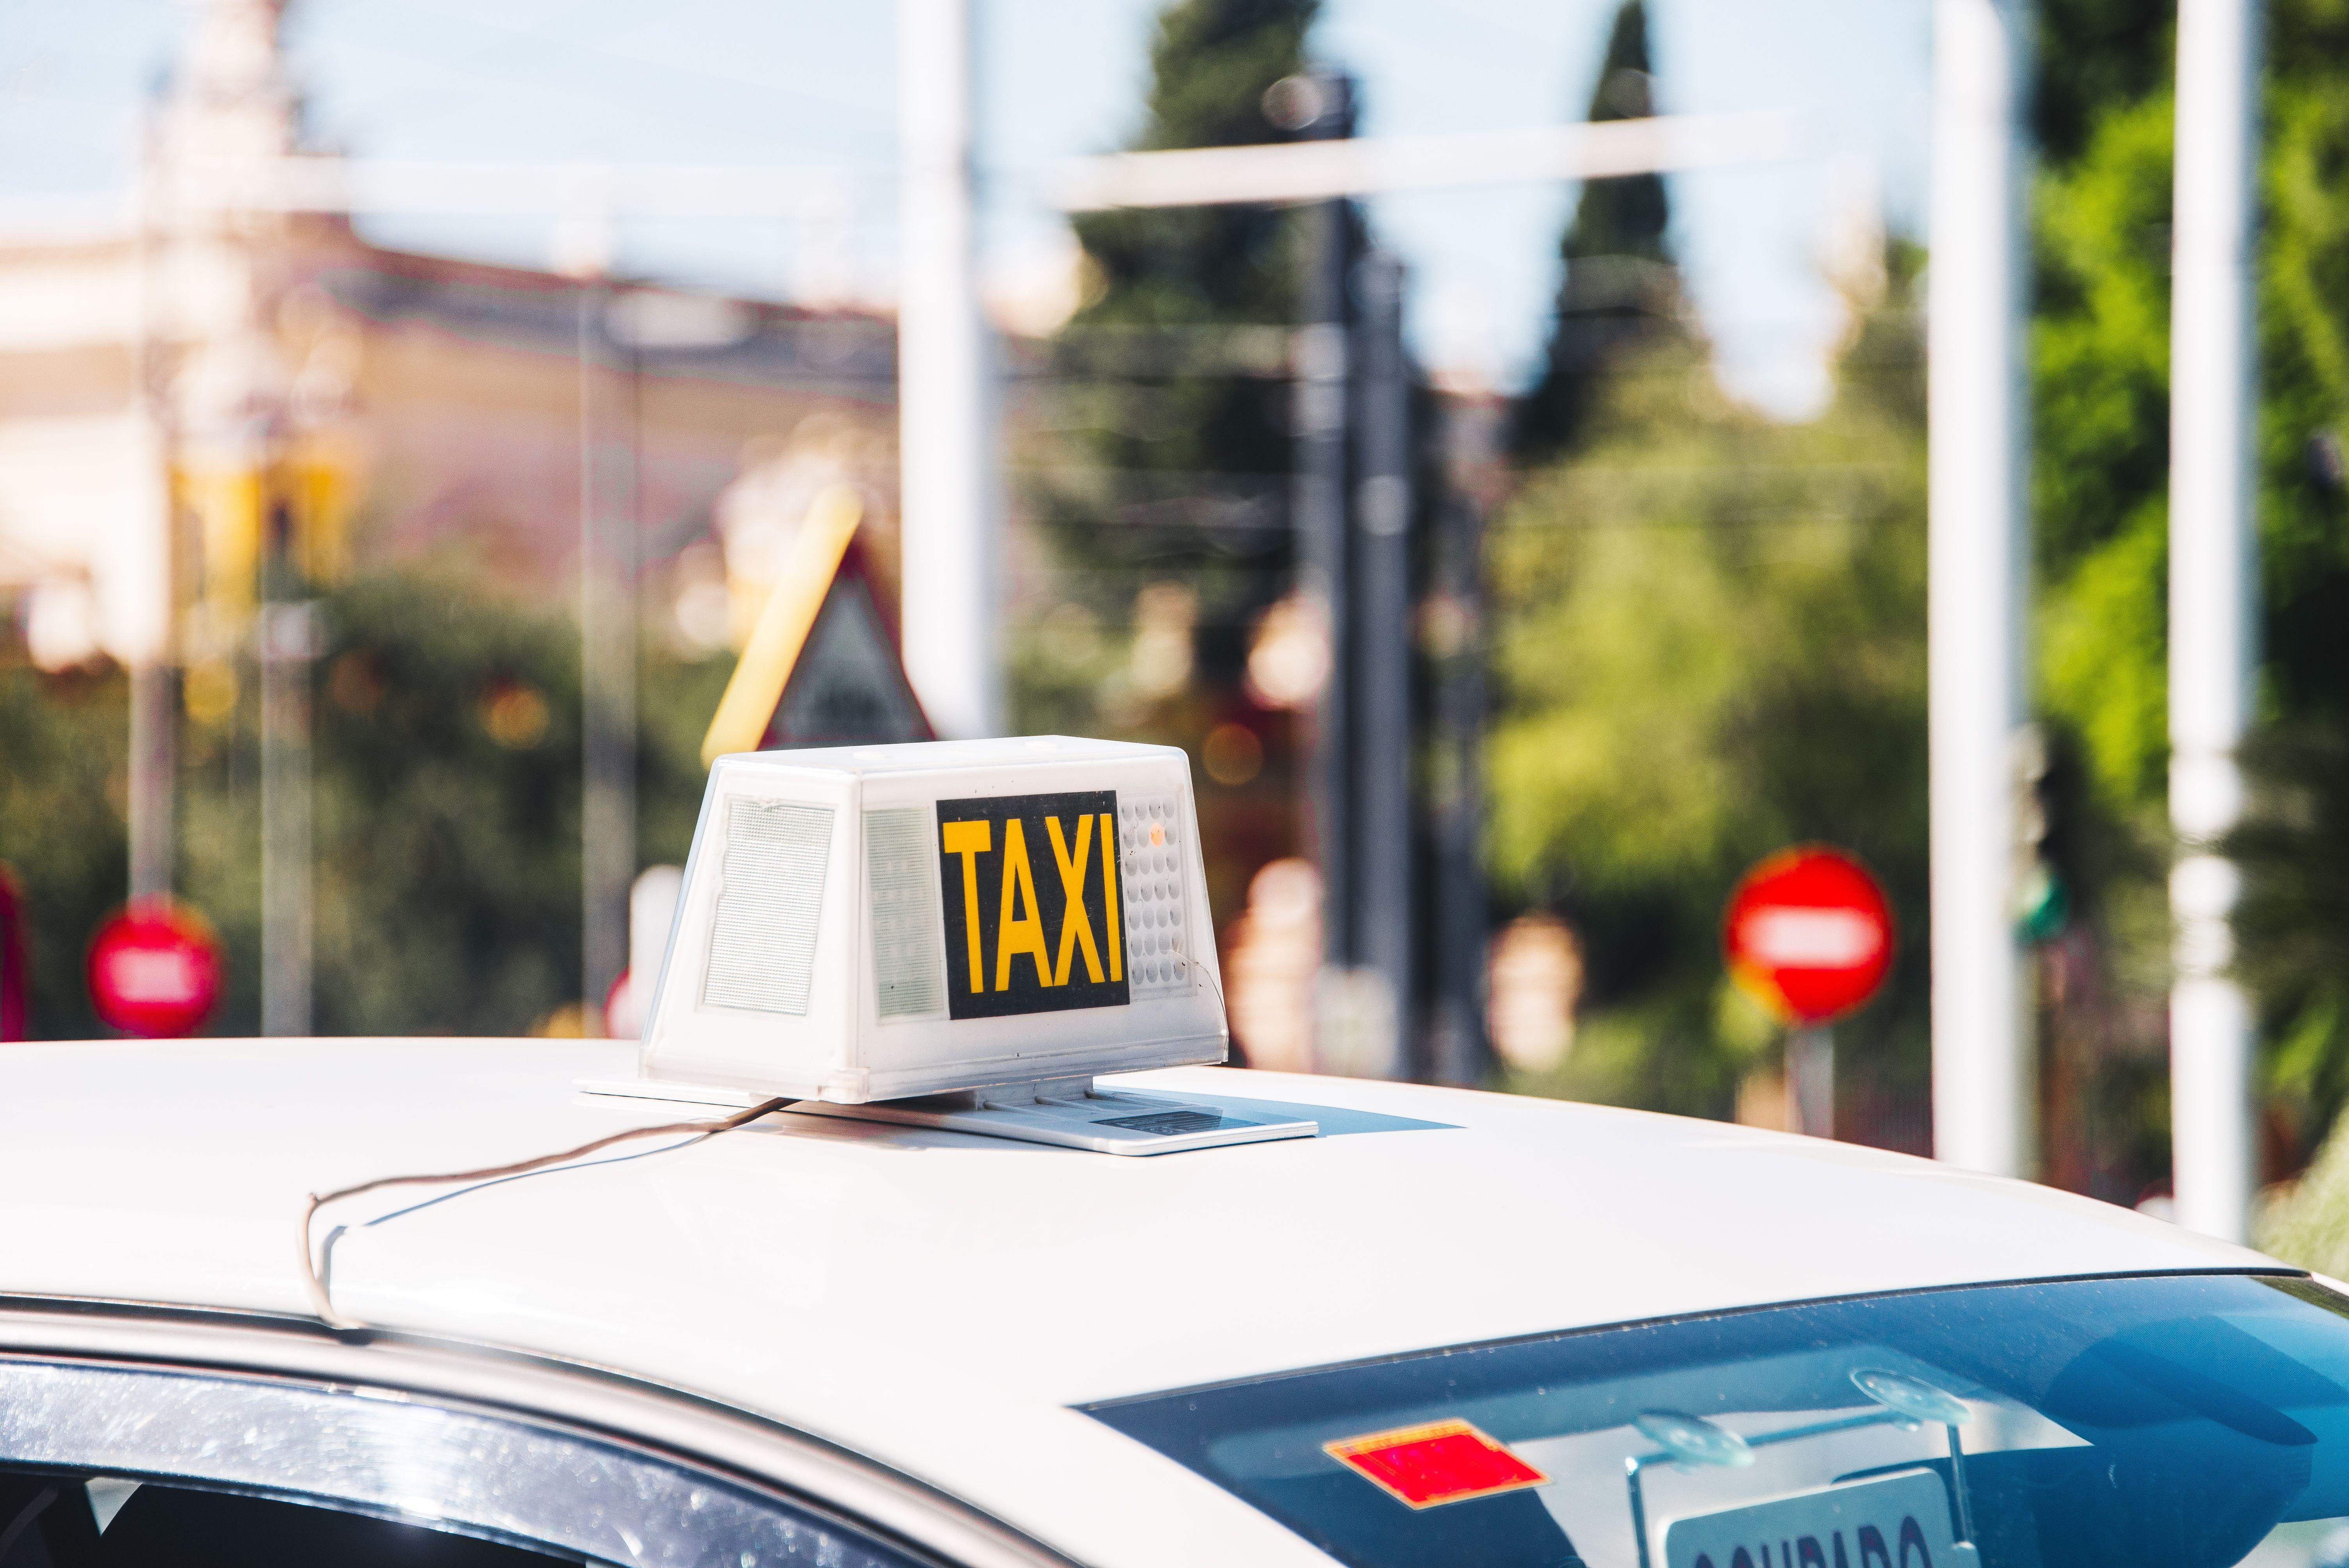 Taxi de 7 plazas en Manresa